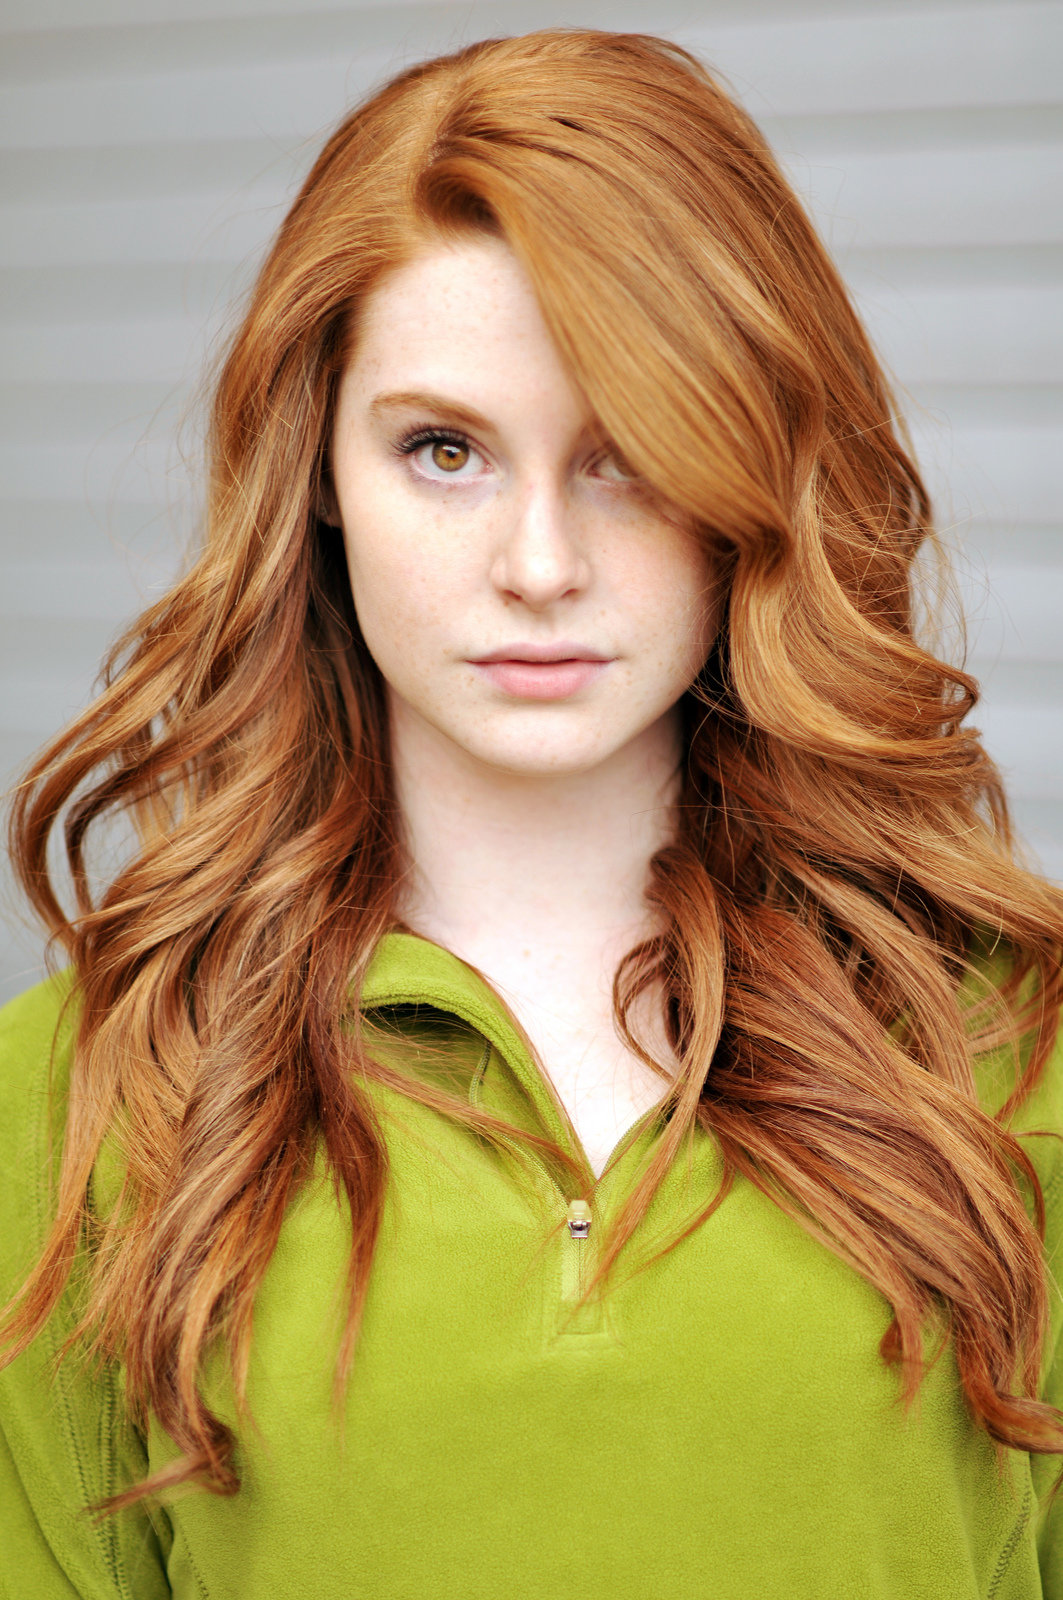 hair-cut-redhead-video-noelia-sex-scandal